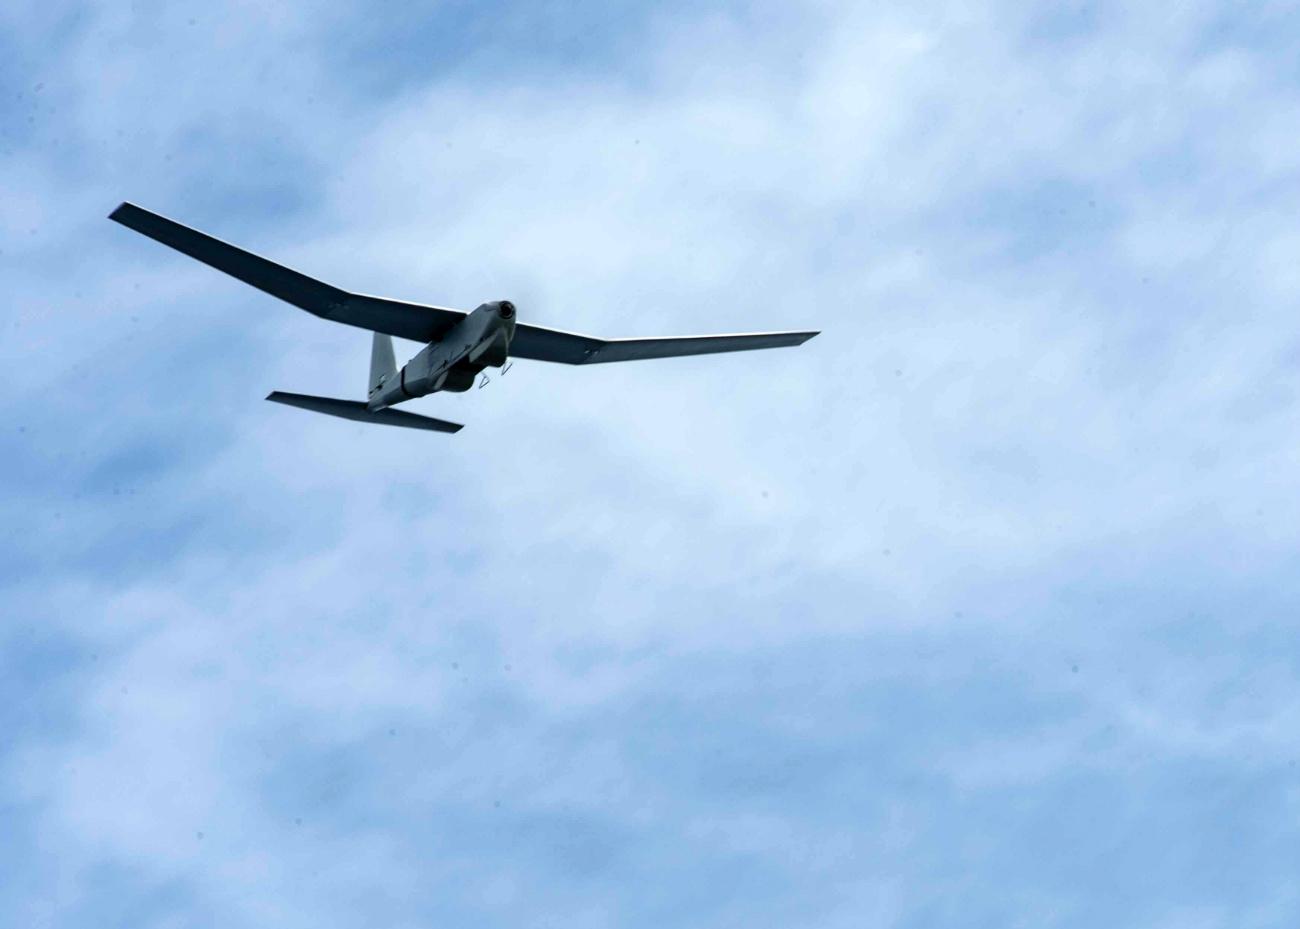 RQ-20 Puma - Flying overhead